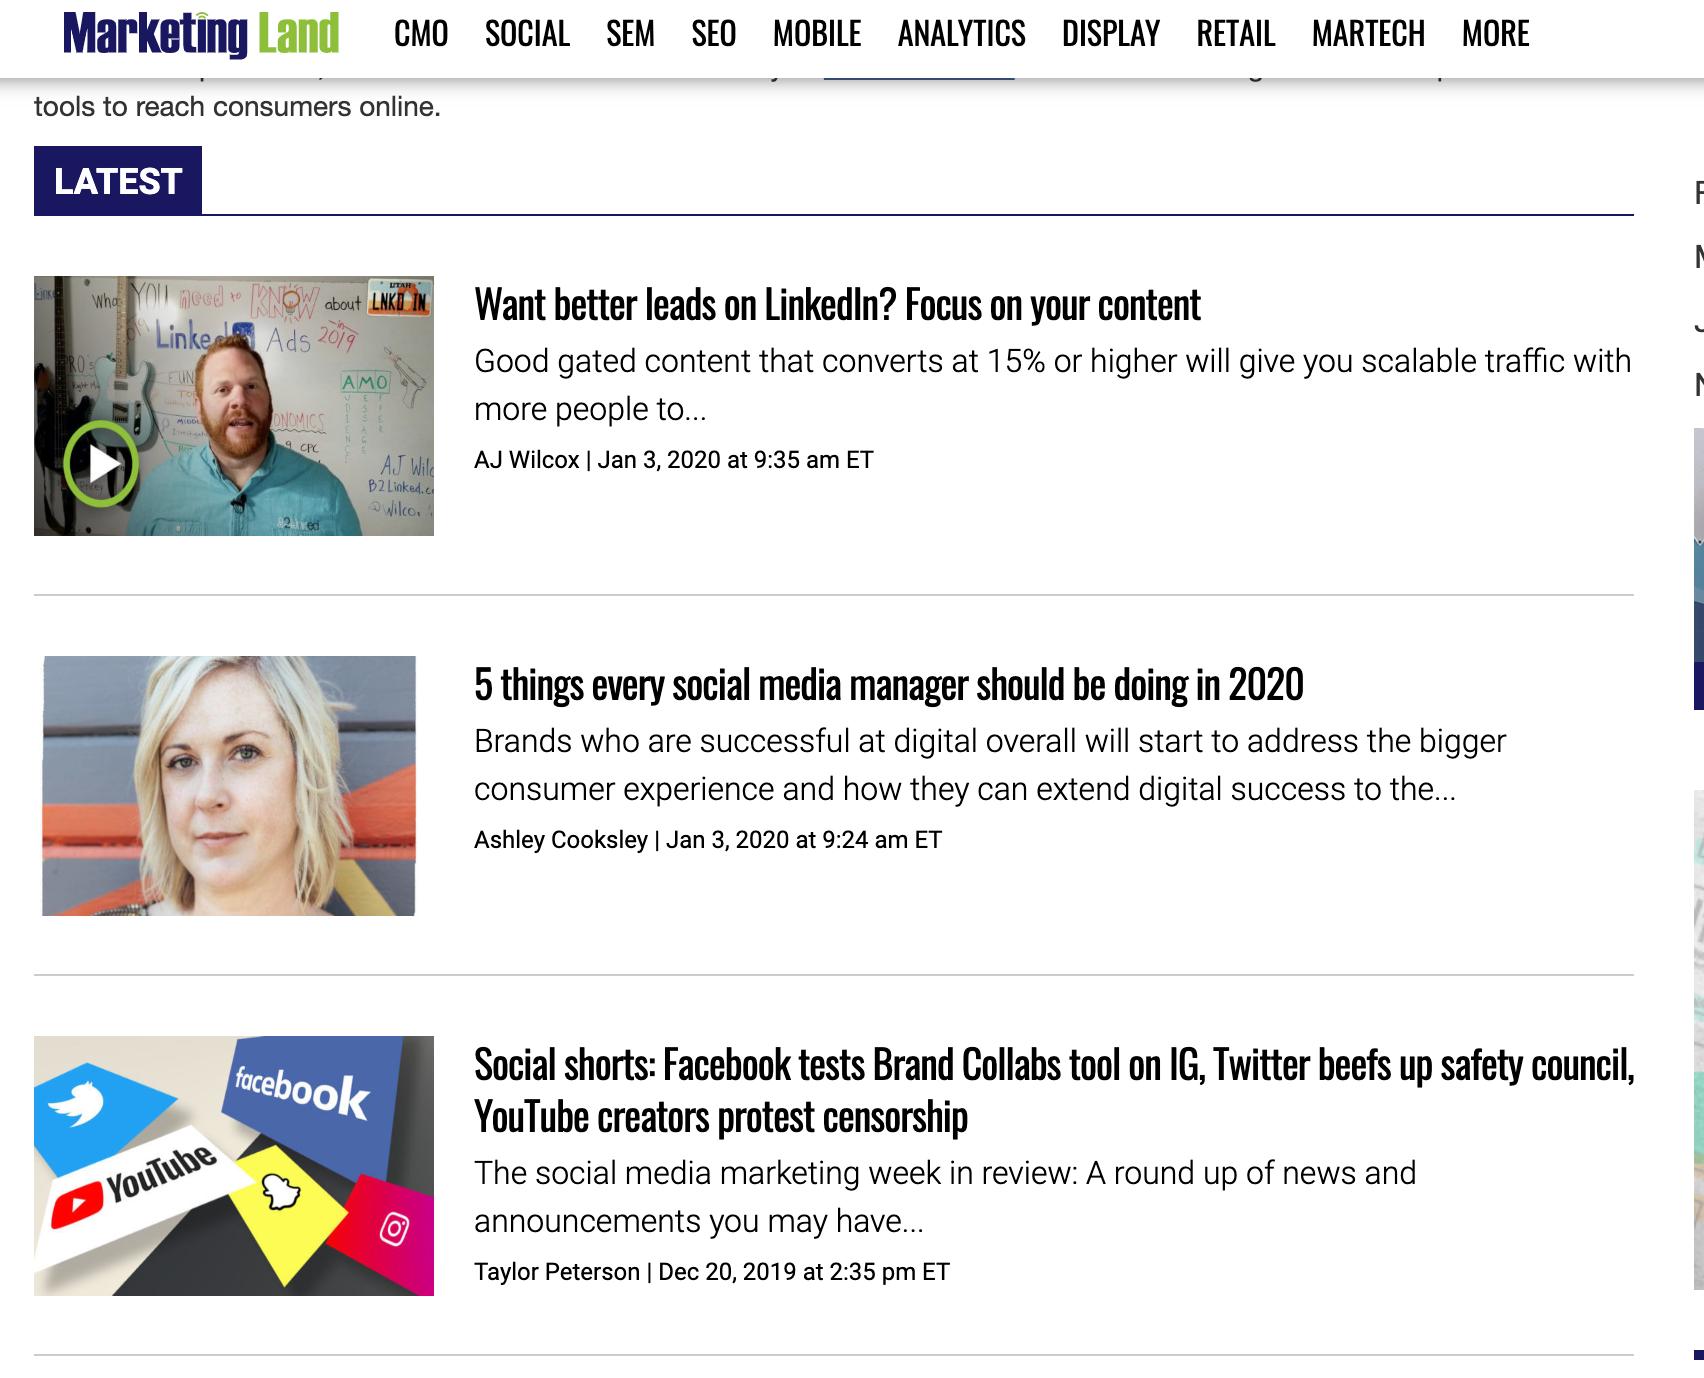 Marketing Land Blog - Social media blogs you should be reading